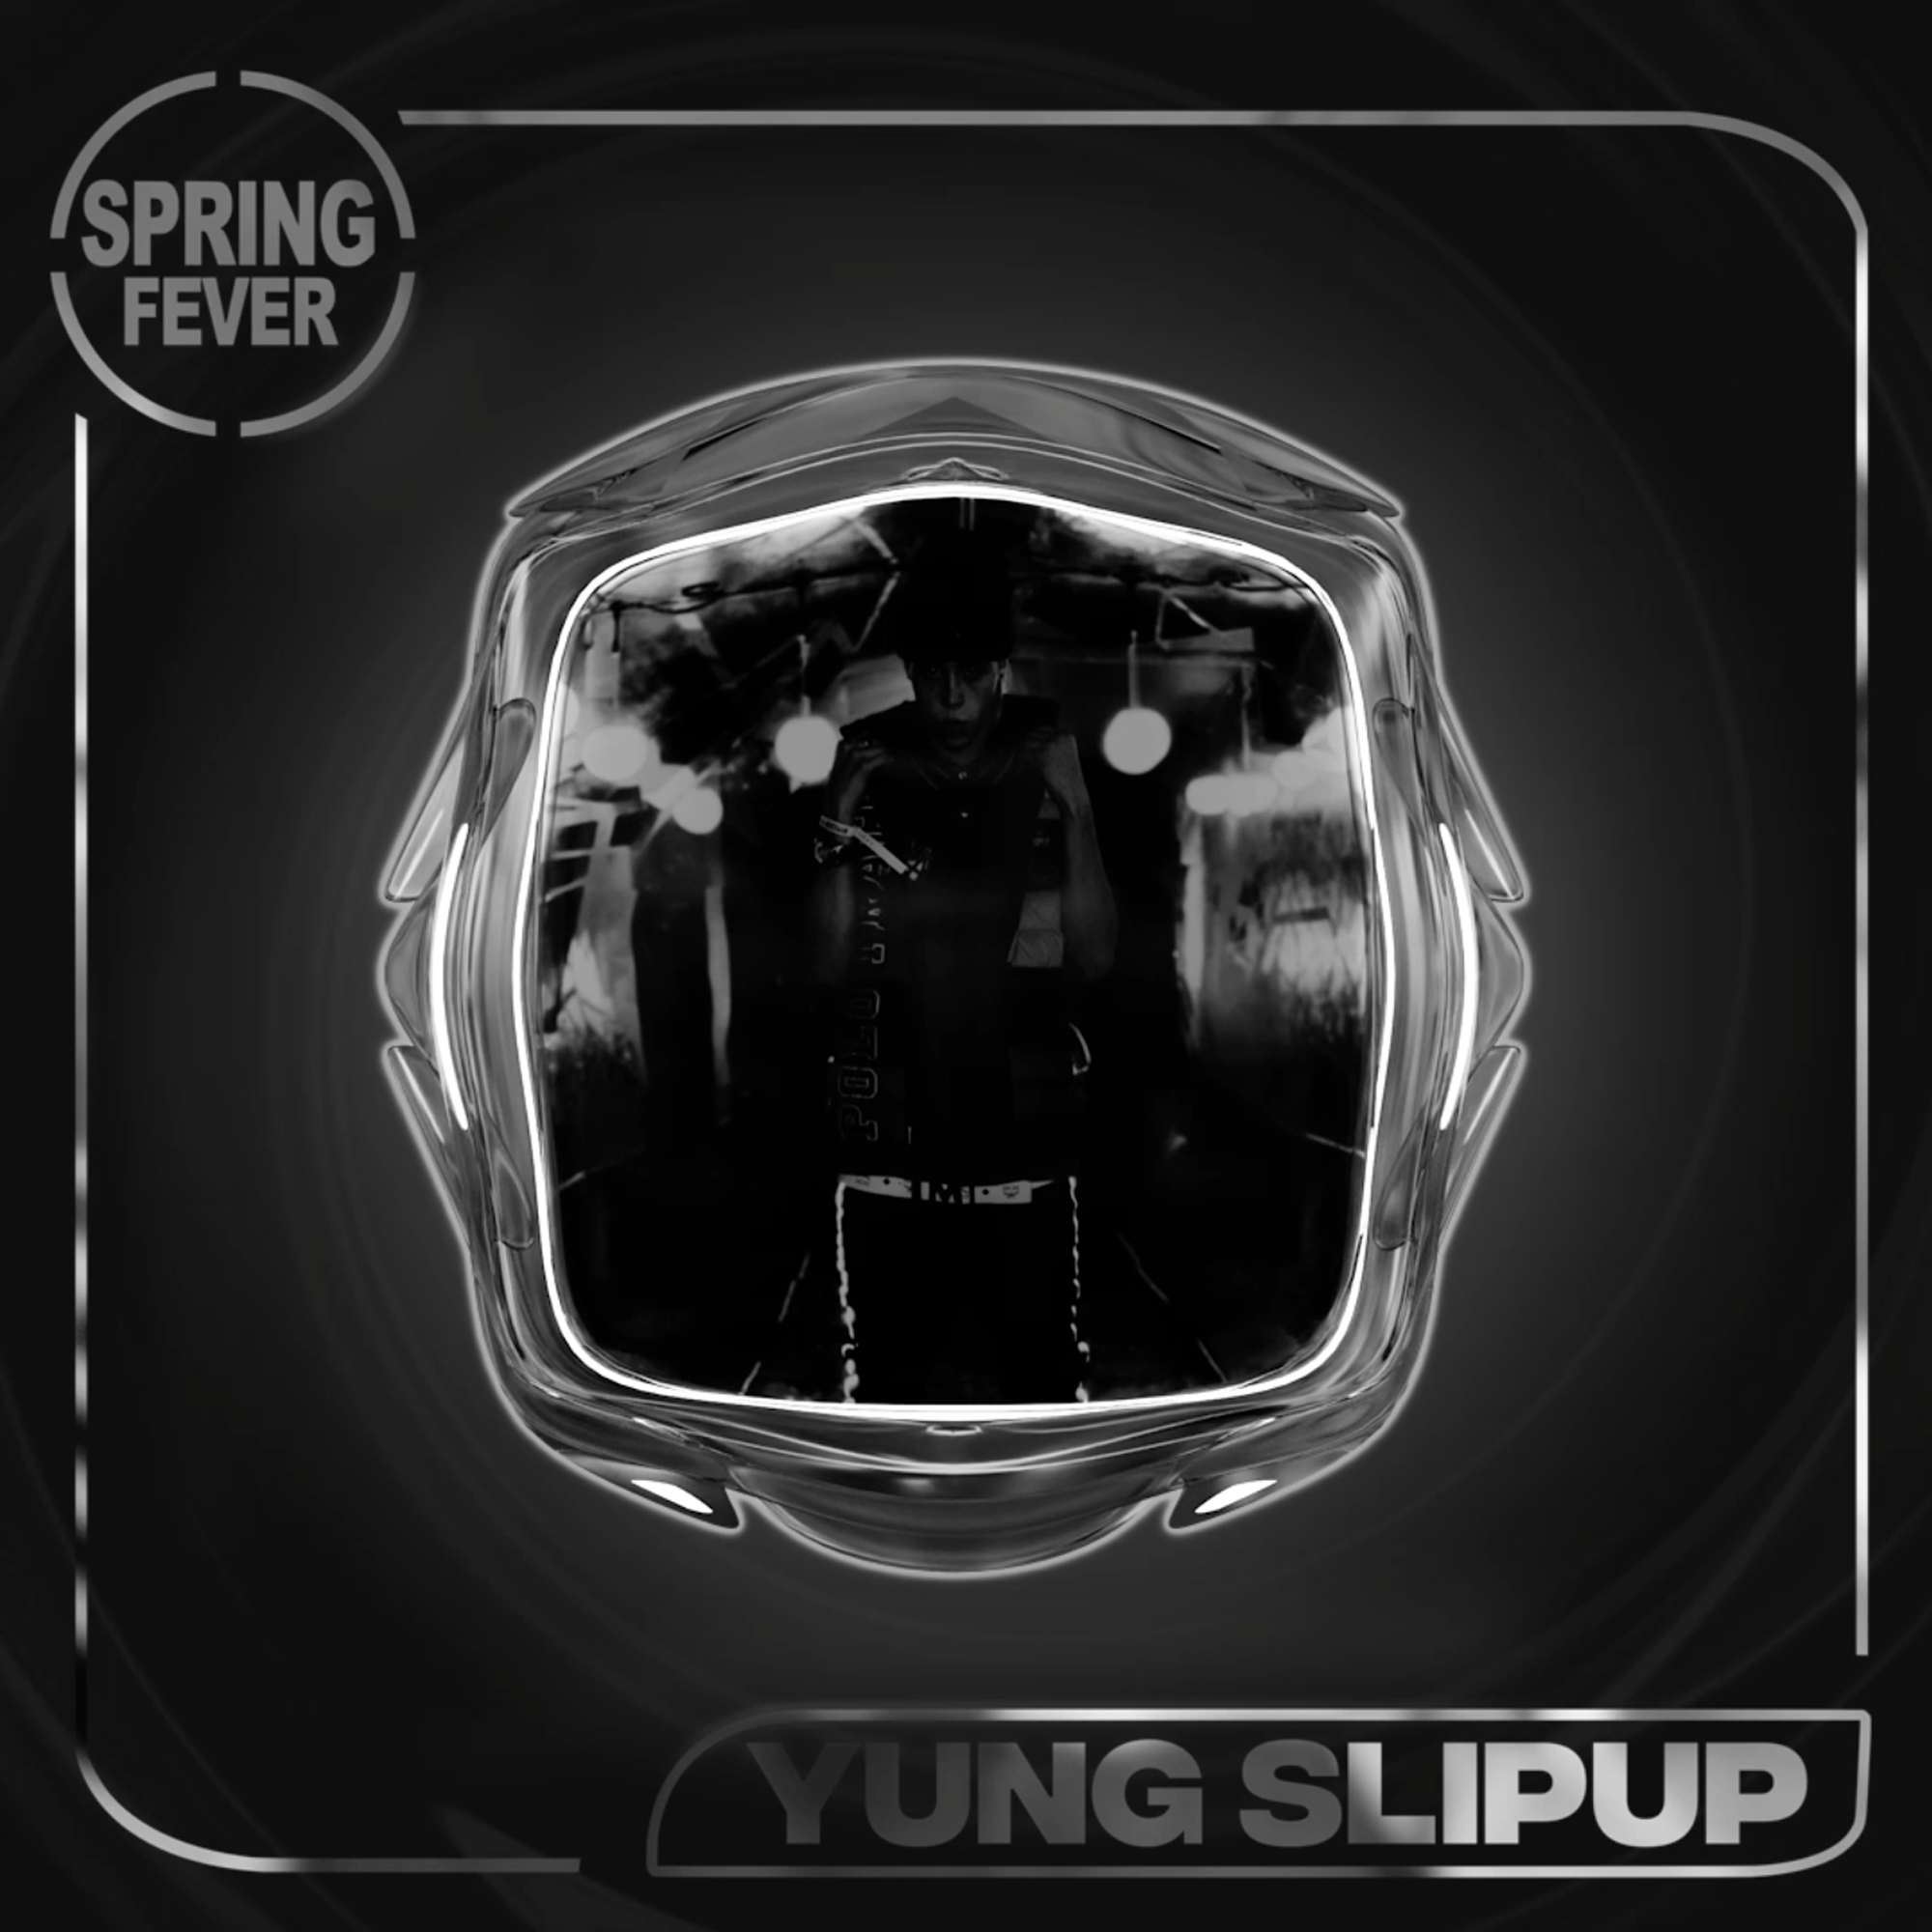 Yung Slipup